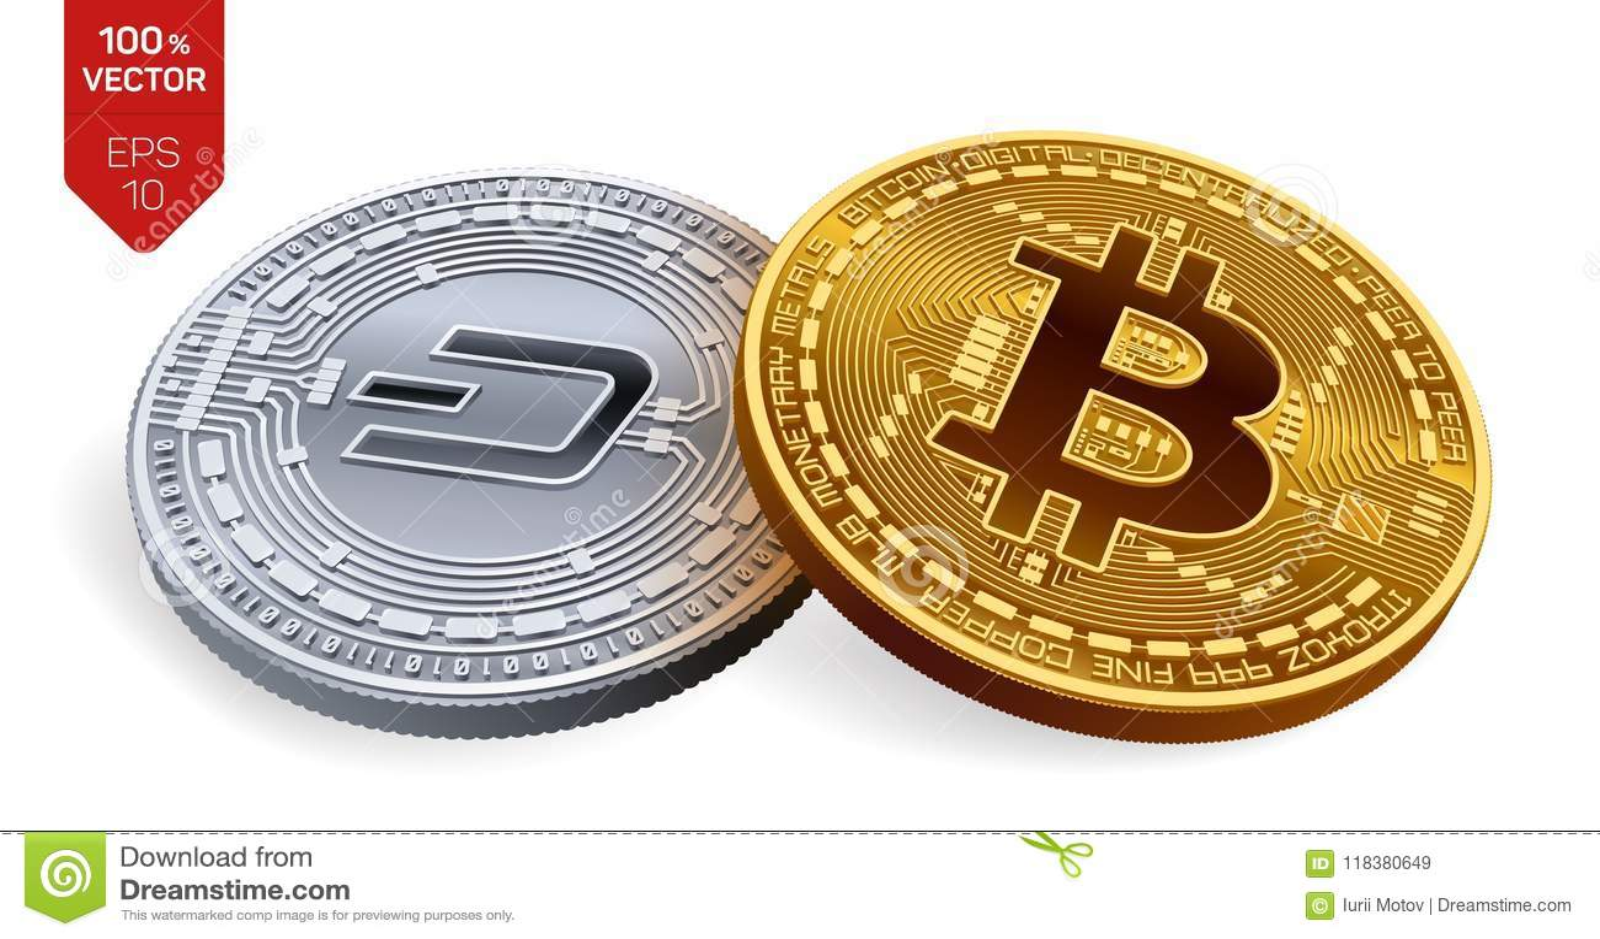 TÜRKİYE Bitcoin dash Antminer D3 Antminer S9 Antminer L3 + Alim Satim'